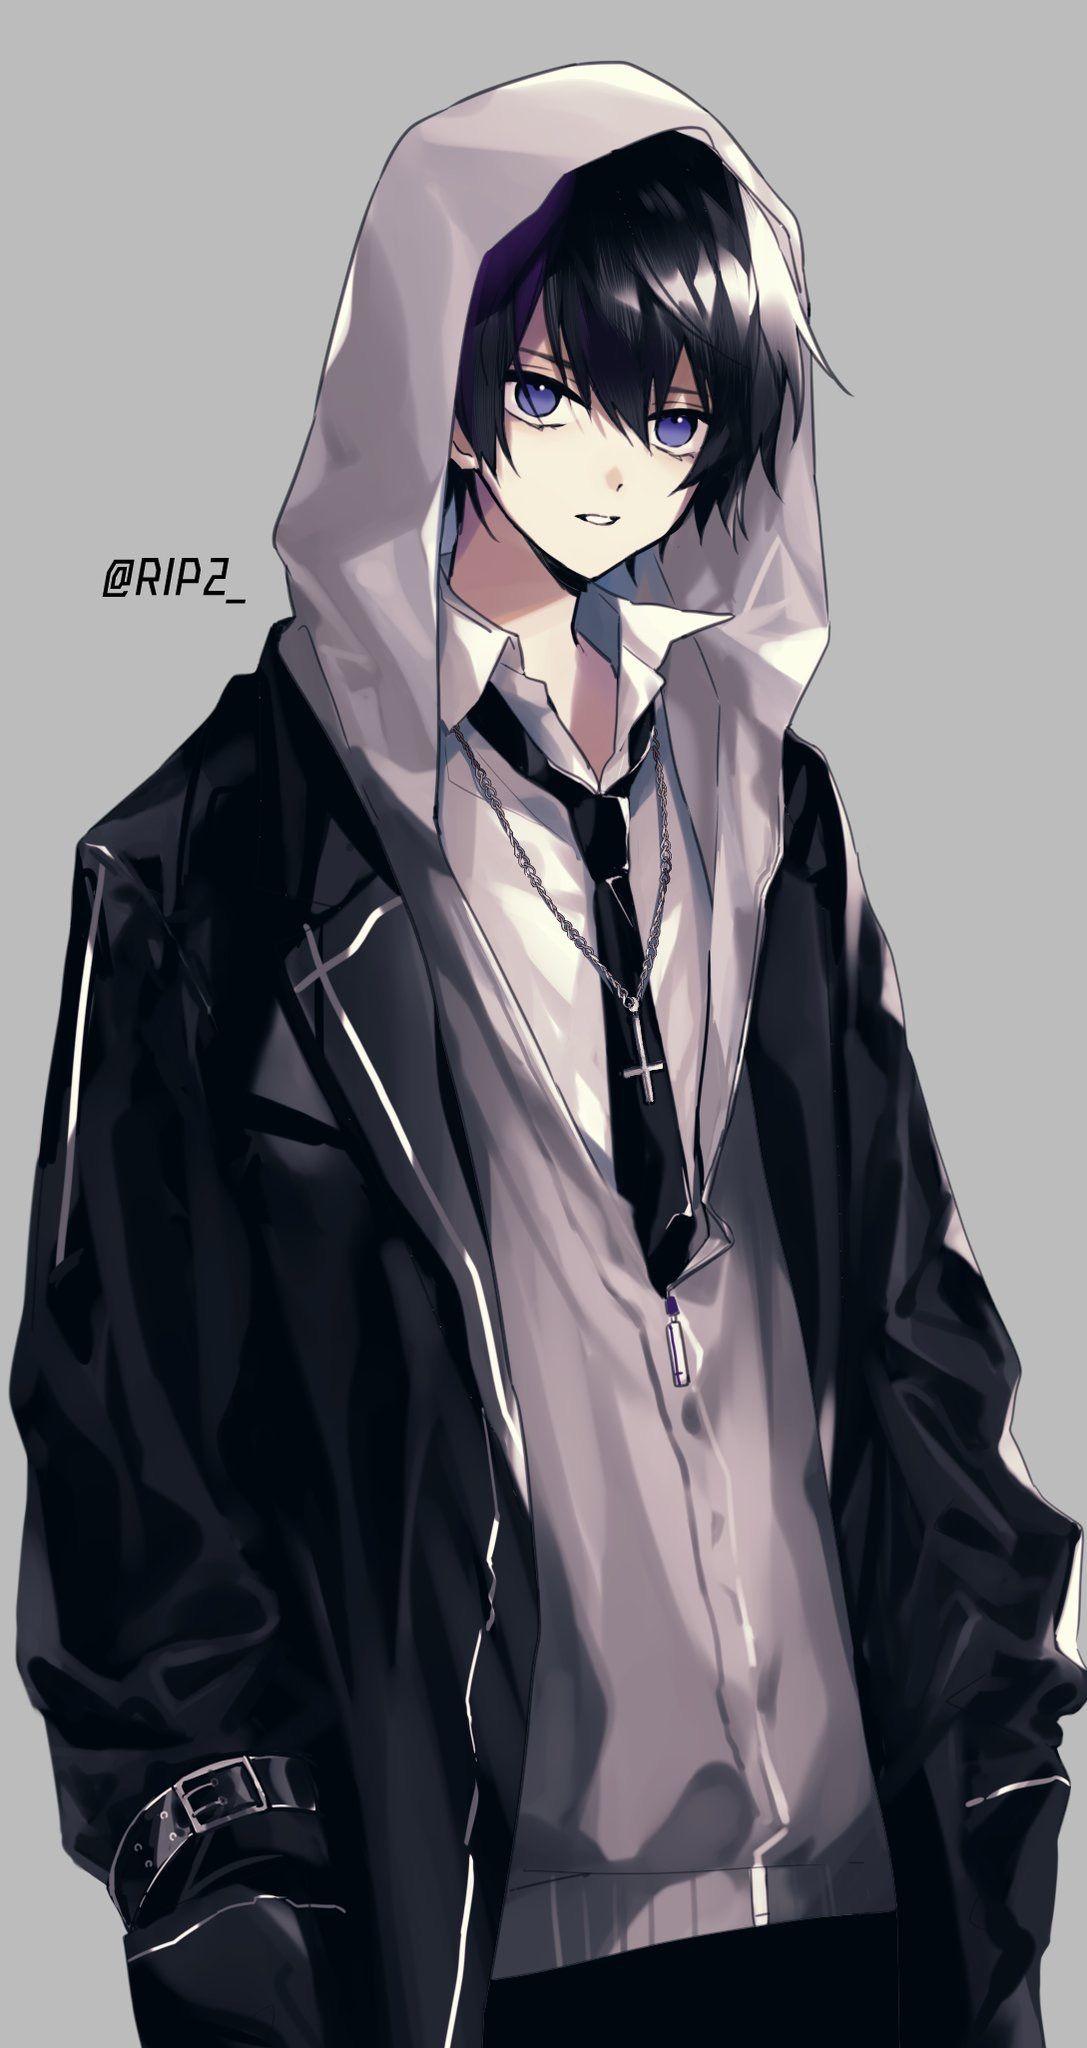 Pin By Chi Lim On Anime Cute Anime Guys Cute Anime Boy Hot Anime Guys